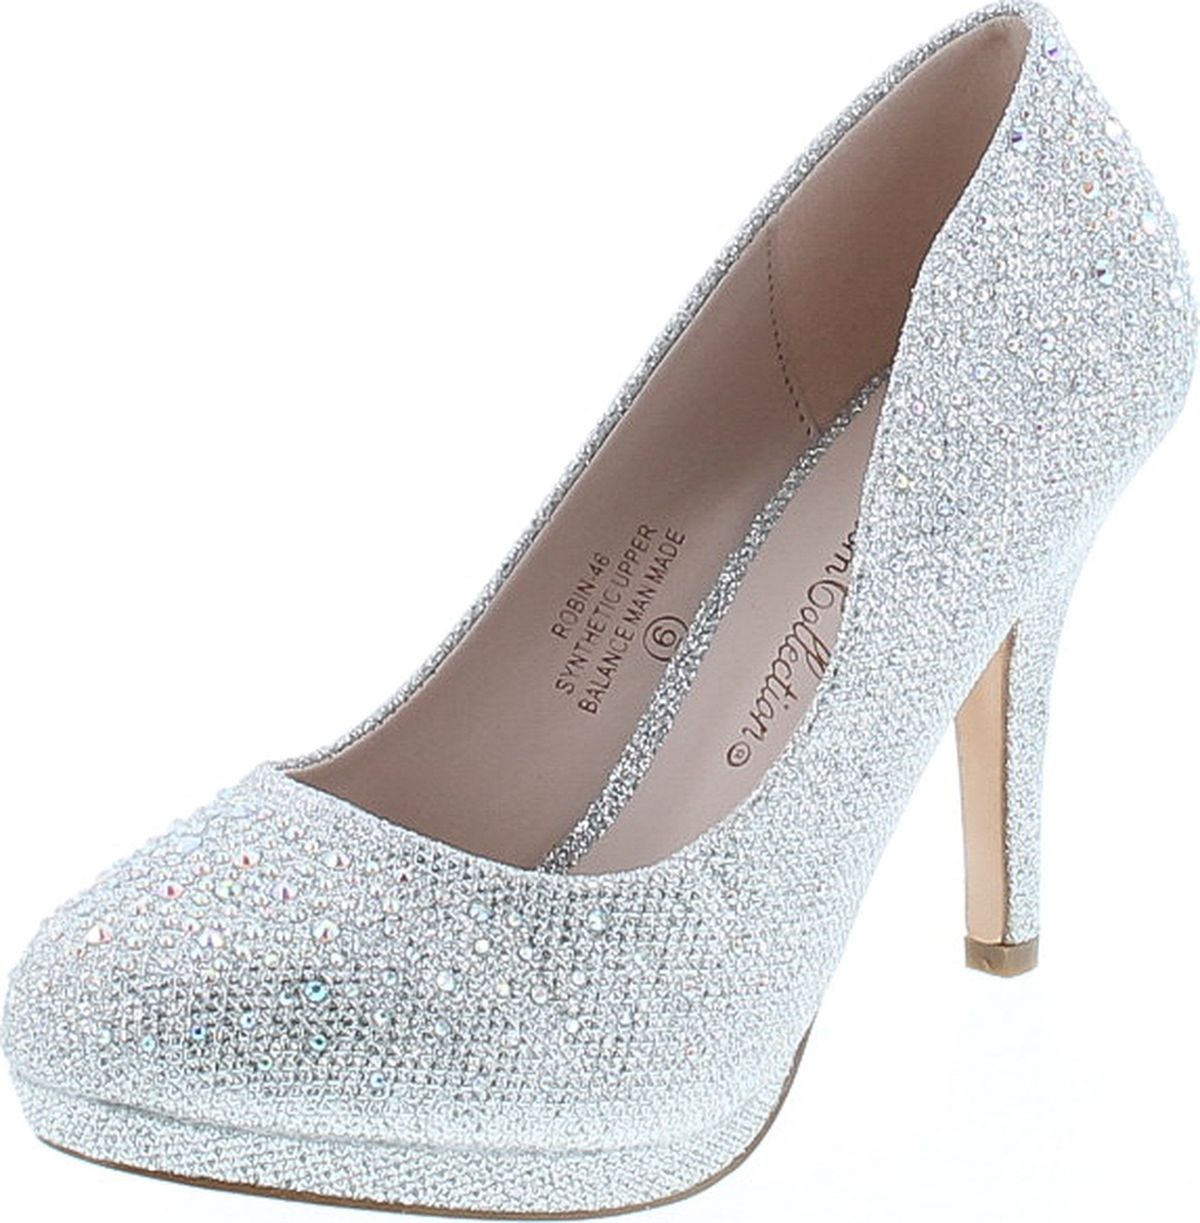 De Blossom Women/'s Spirit-1 Stunning Silver Sparkle Rhinestone Evening Heels